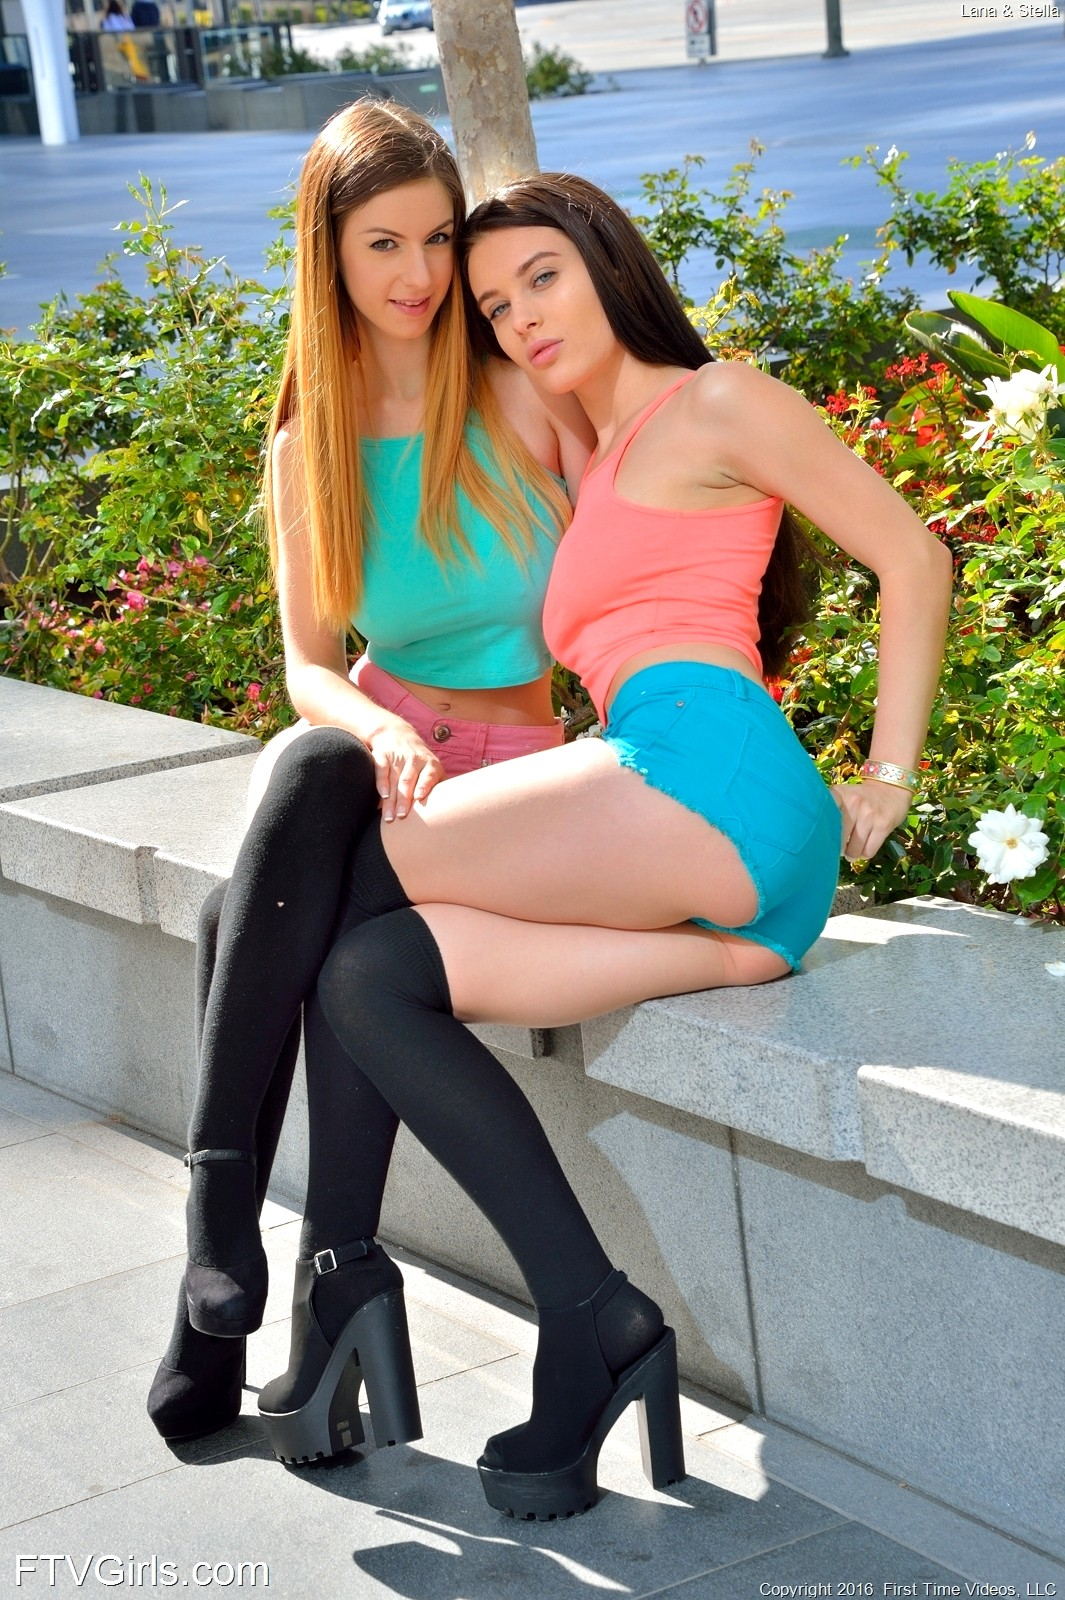 Lana rhoades with stella cox